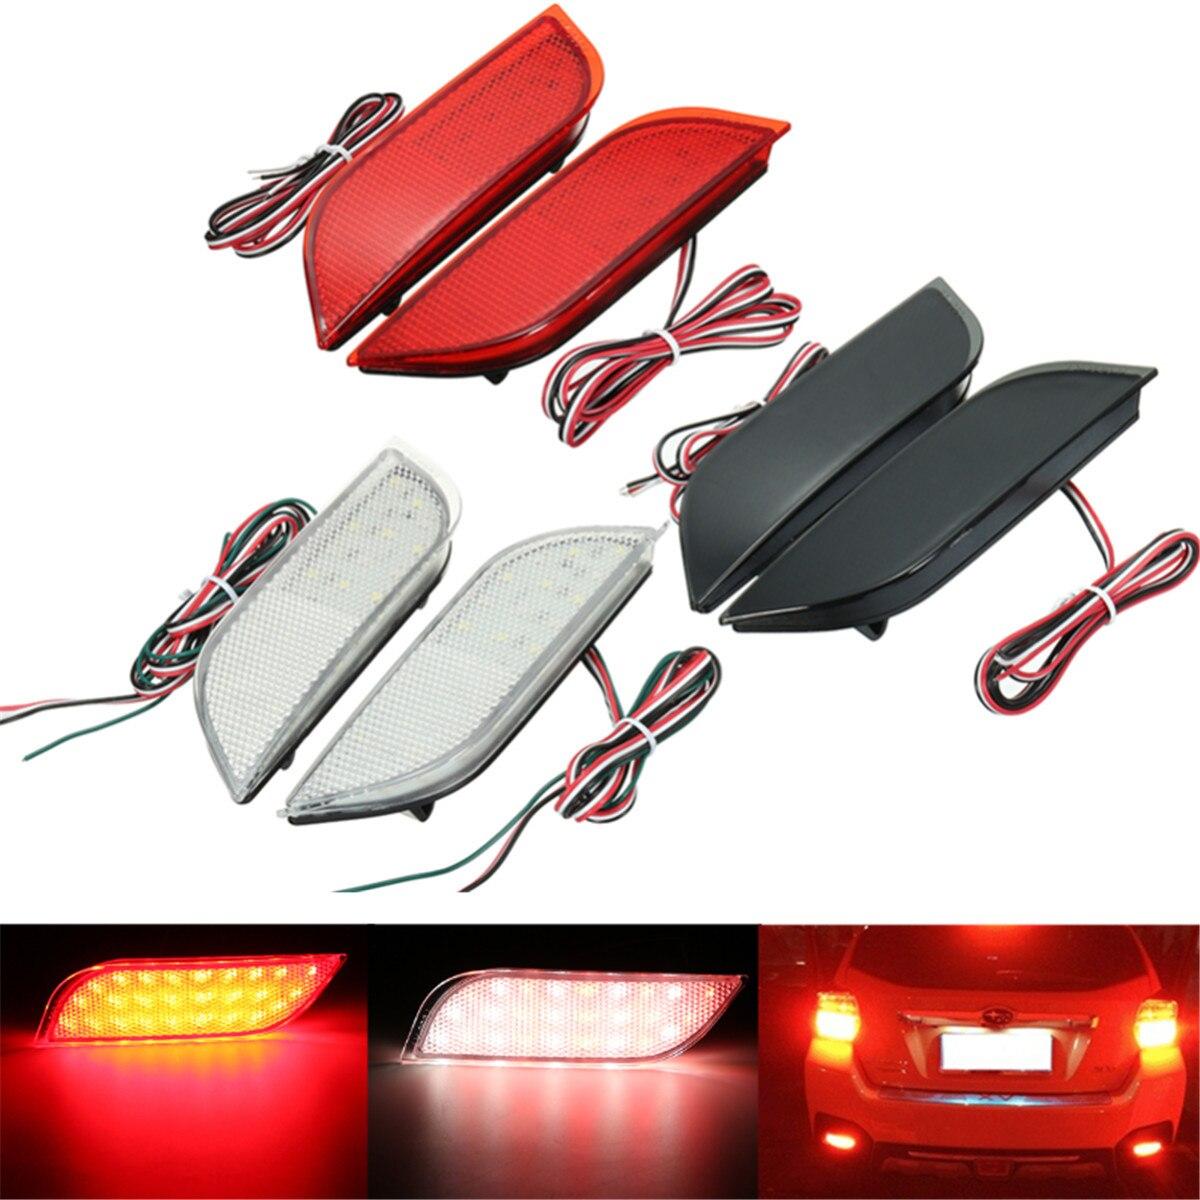 2x Motorbike Red Reflector Rear Tail Brake Turn Signal Light Marker Lamp Plastic